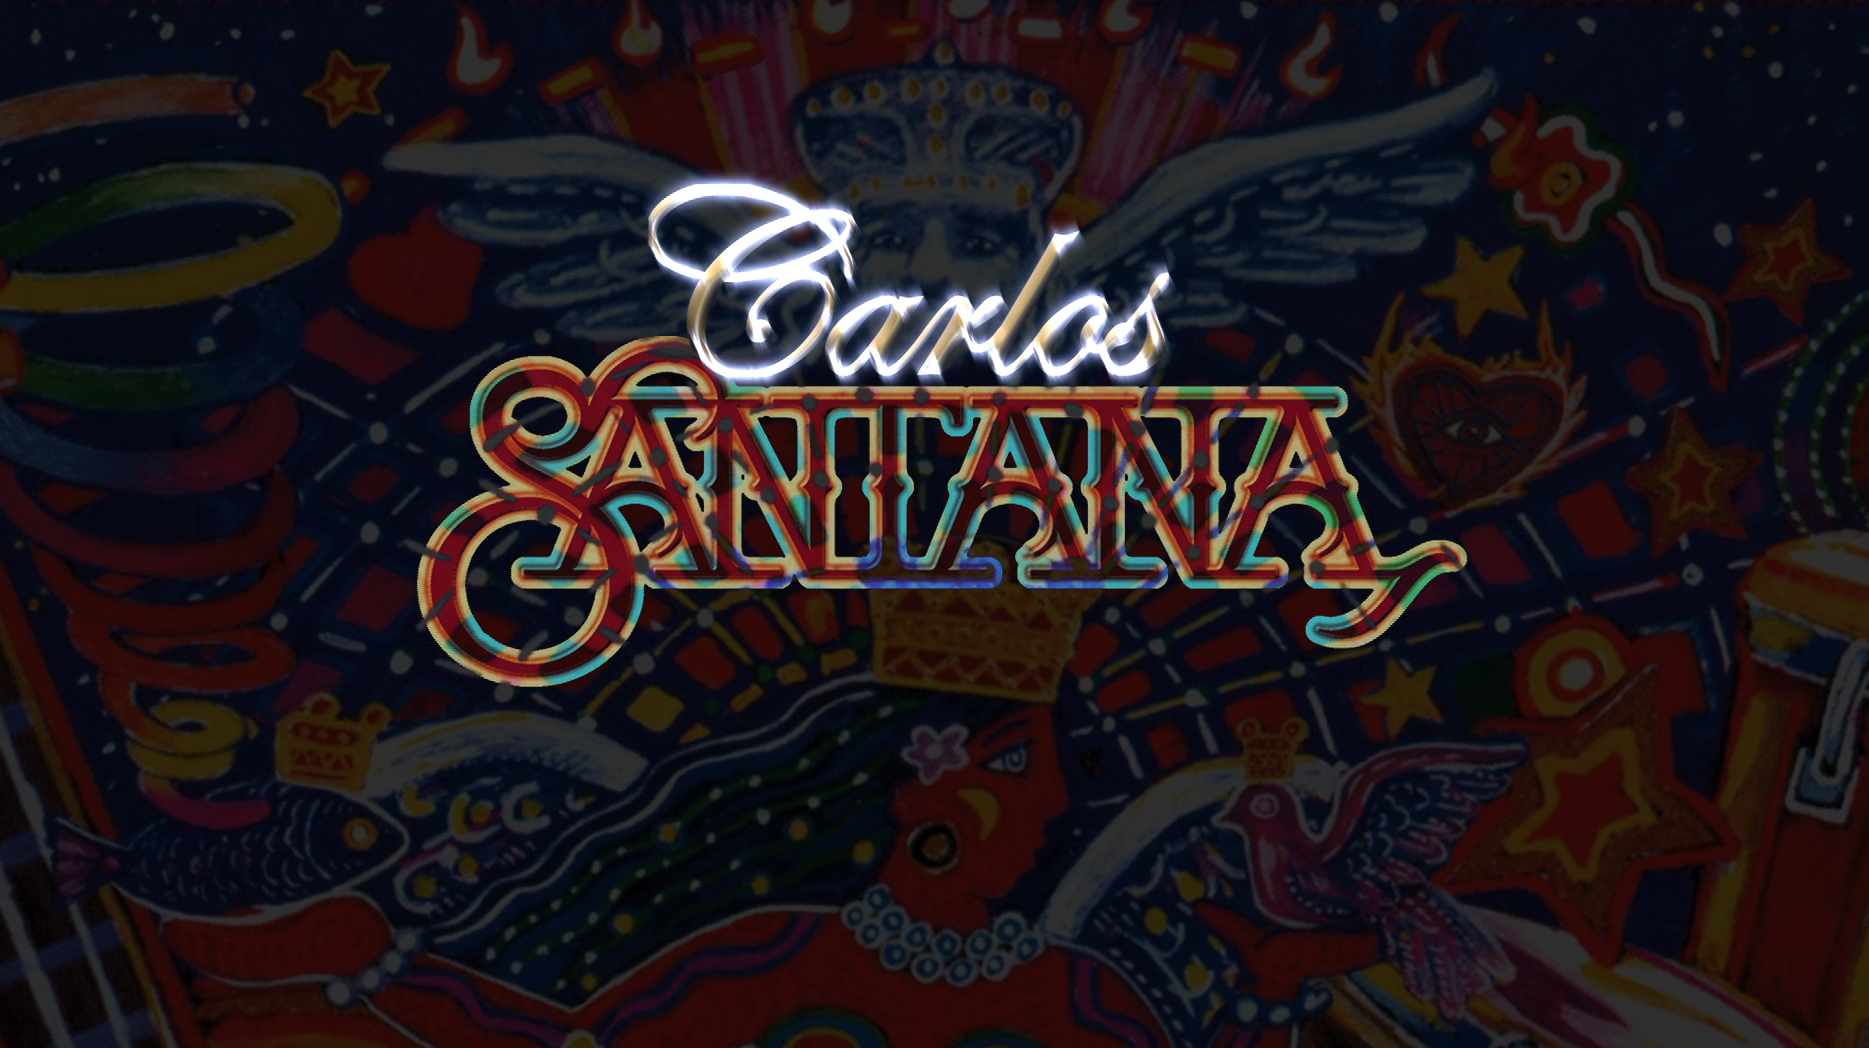 Carlos Santana graphics